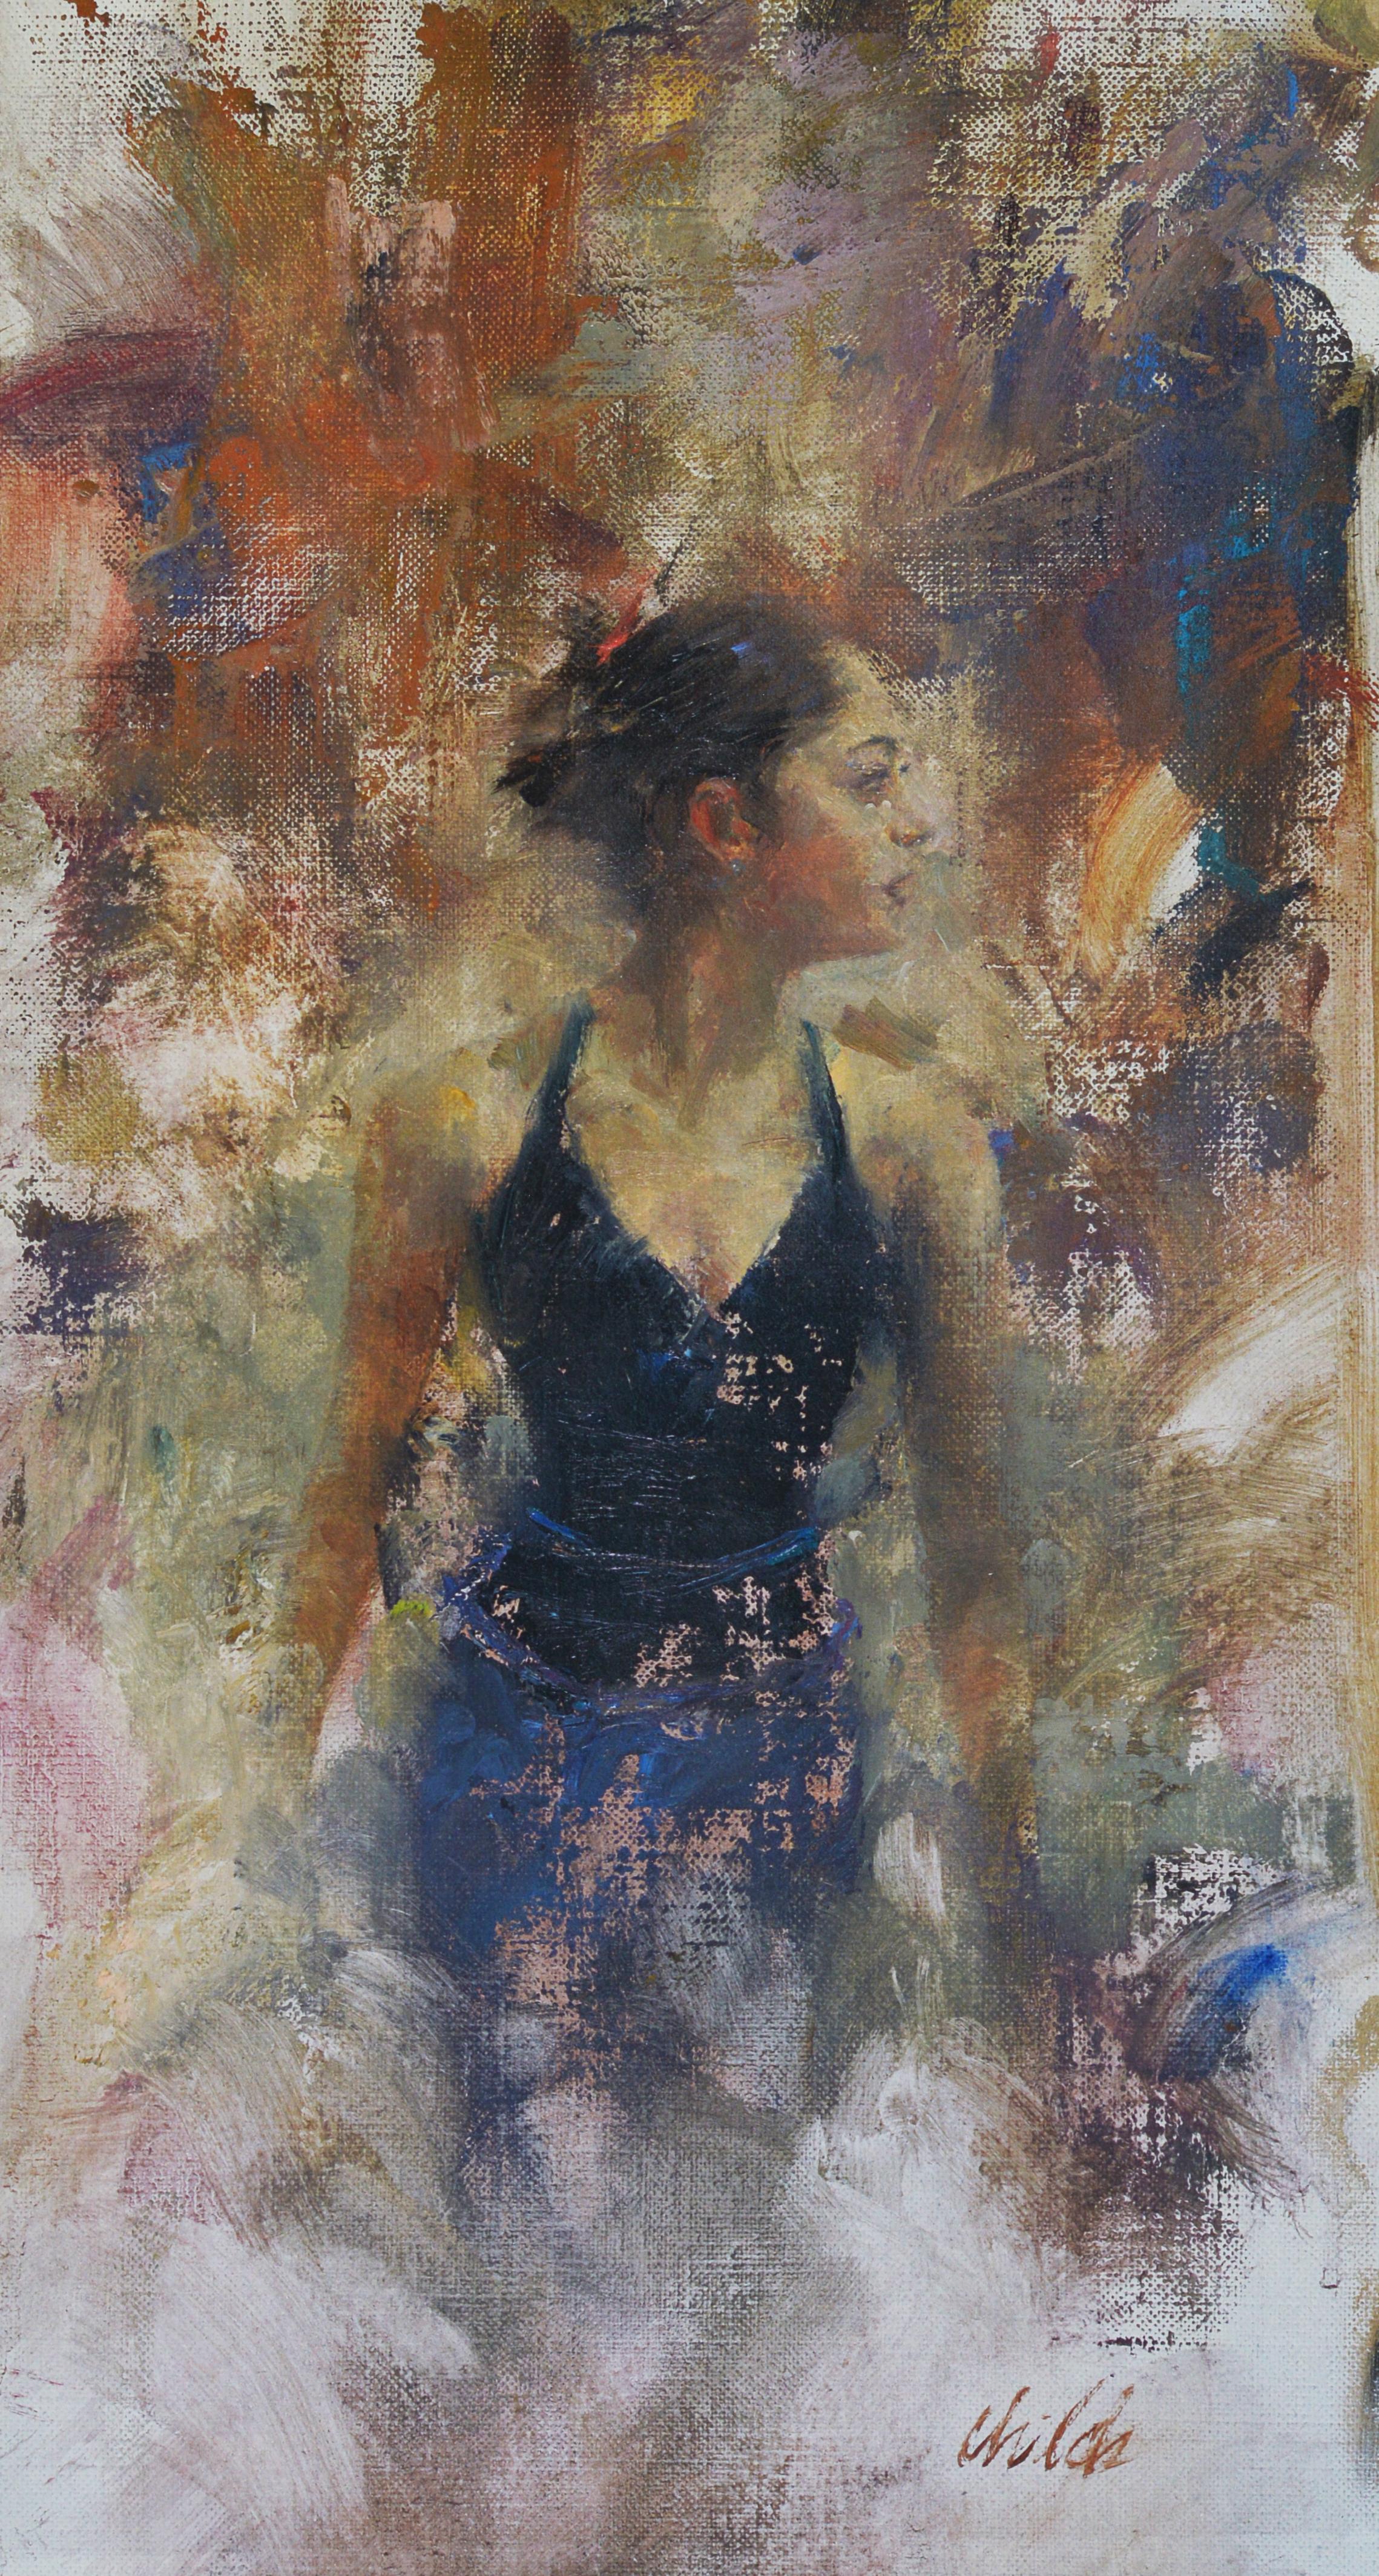 Dance Painting - 19x9